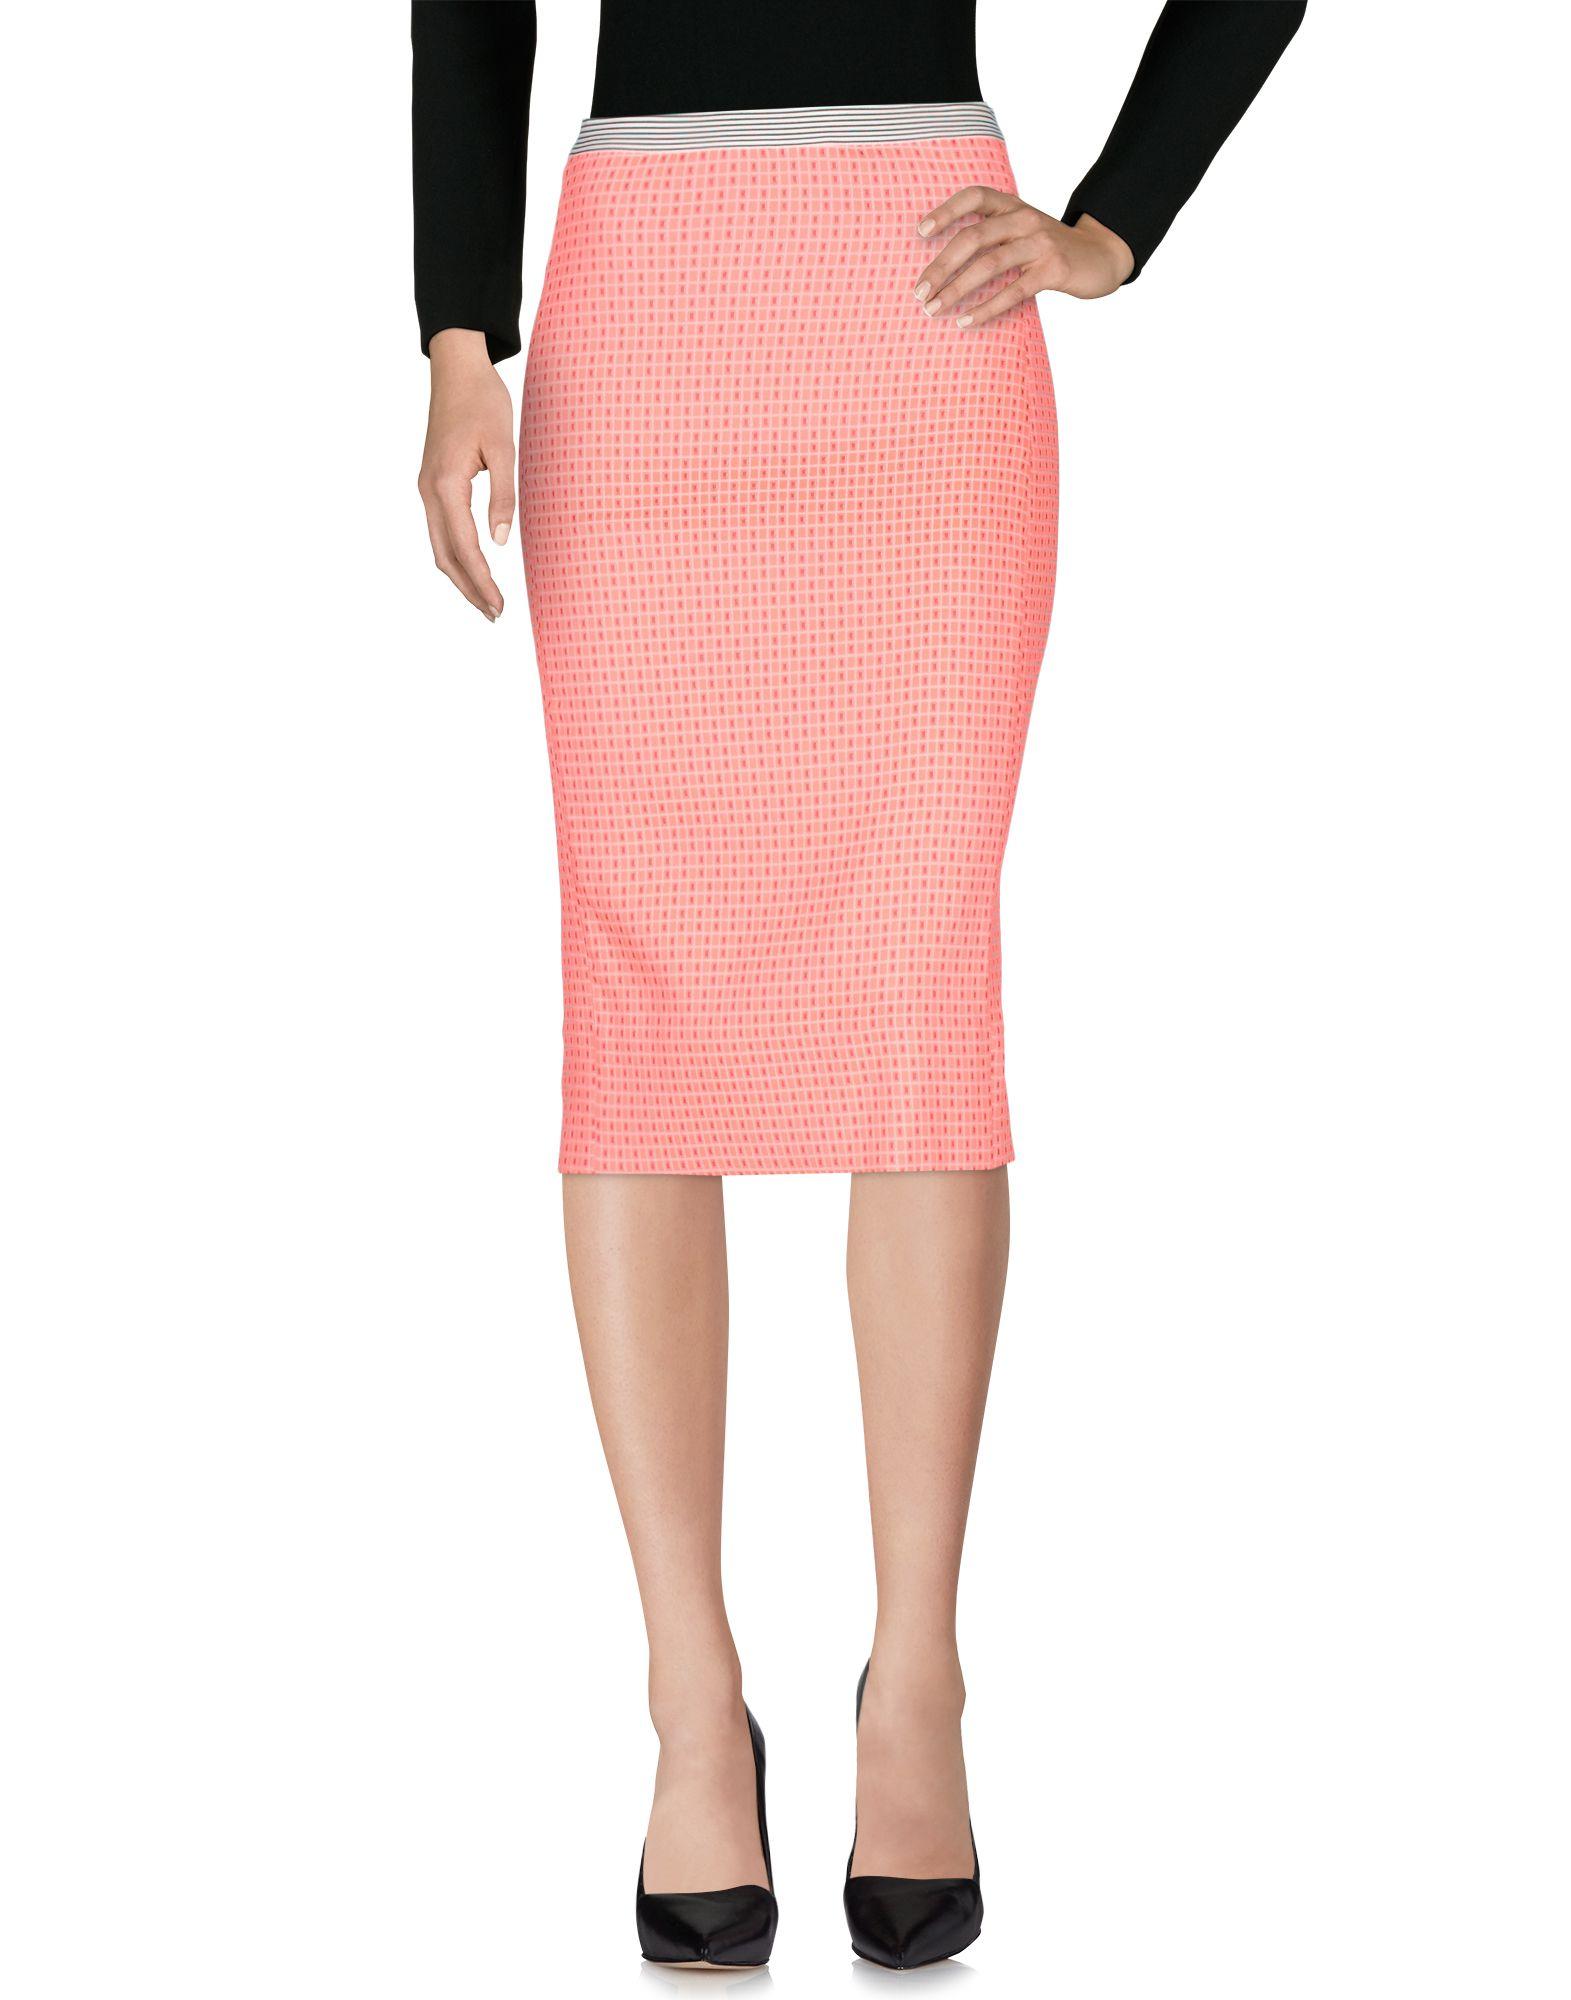 Shoppable Search Camila Stripes Skirt Leux Studio Navy L 35324470ko 14 F